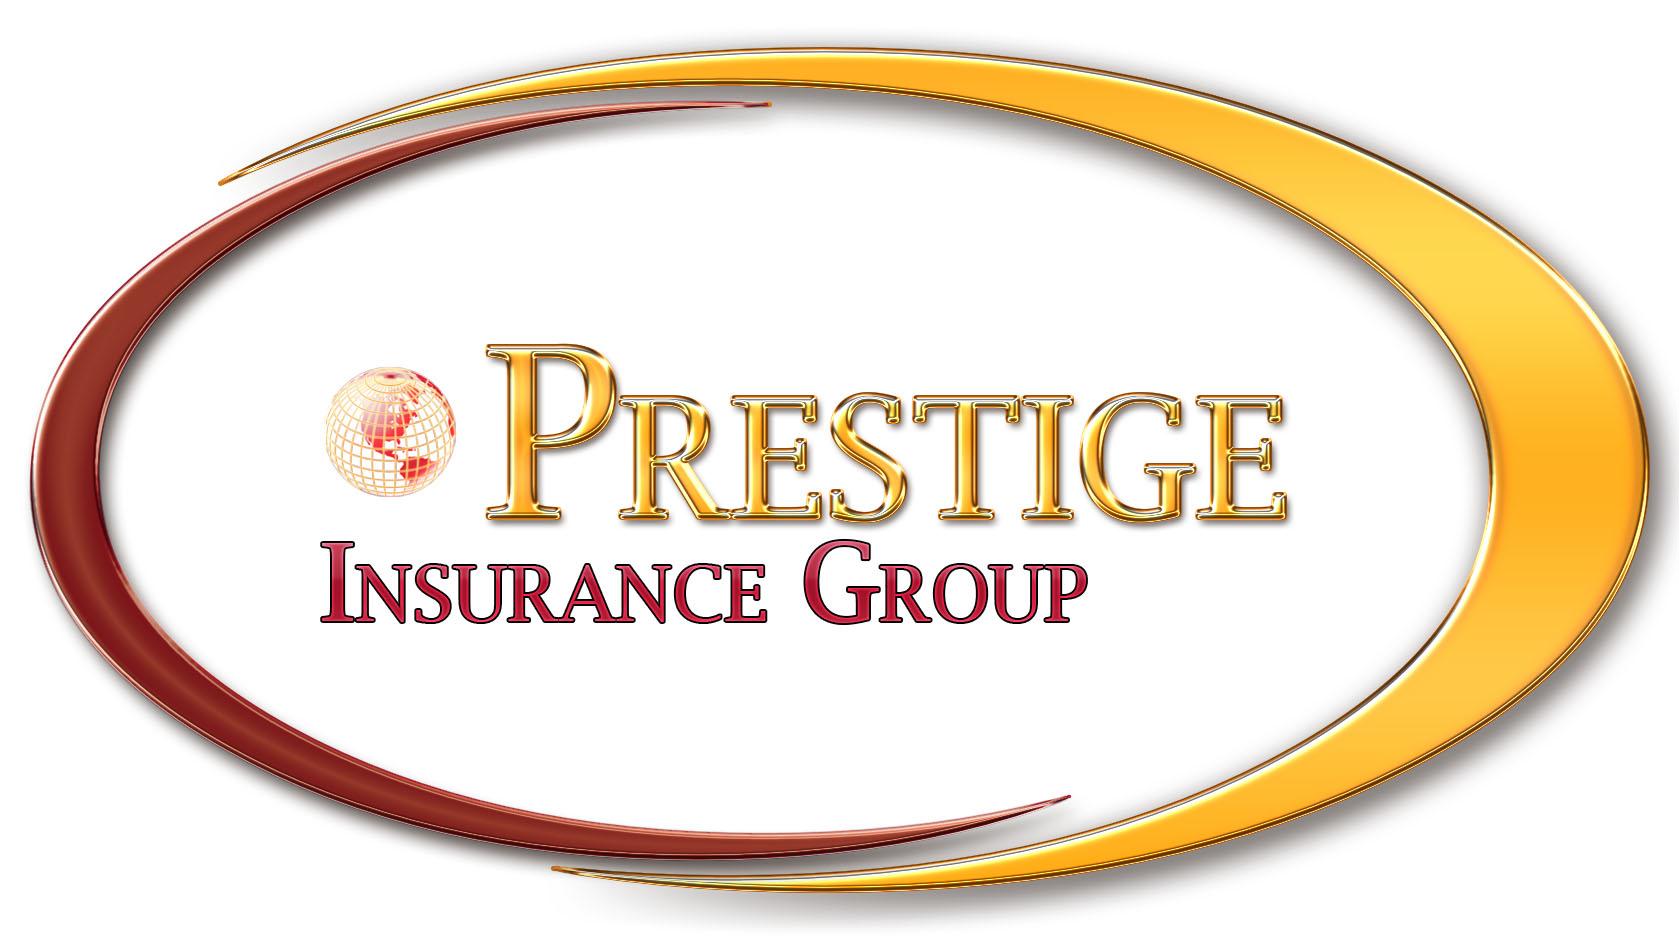 Prestige Insurance Group Inc.